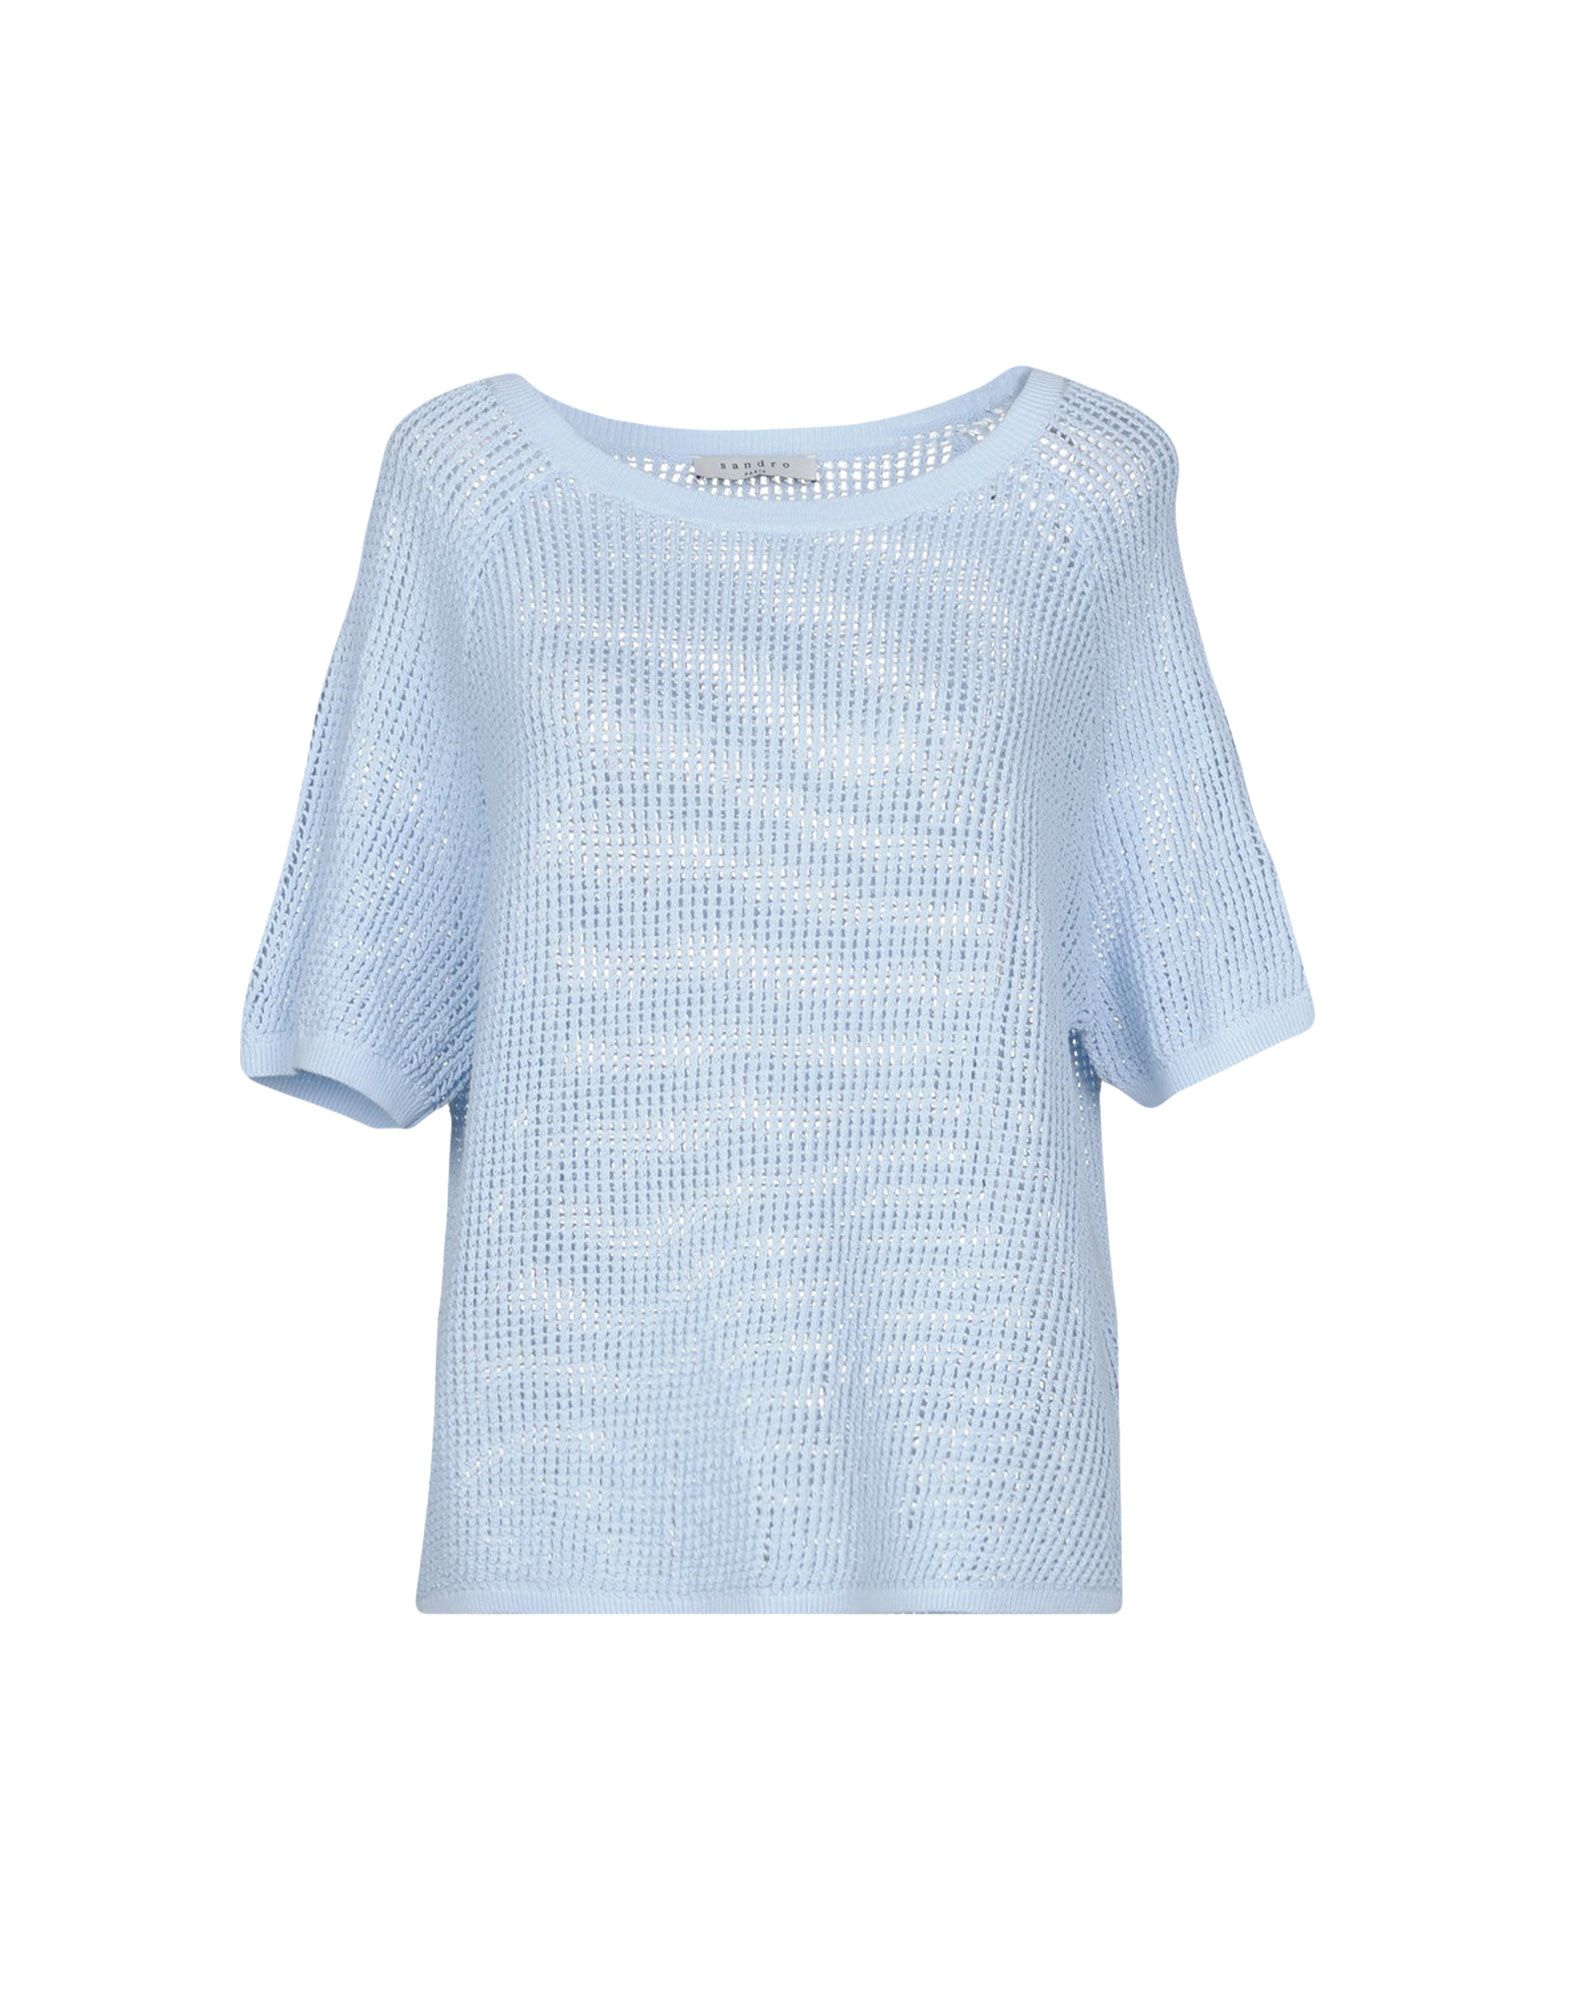 SANDRO PARIS Sweater in Sky Blue